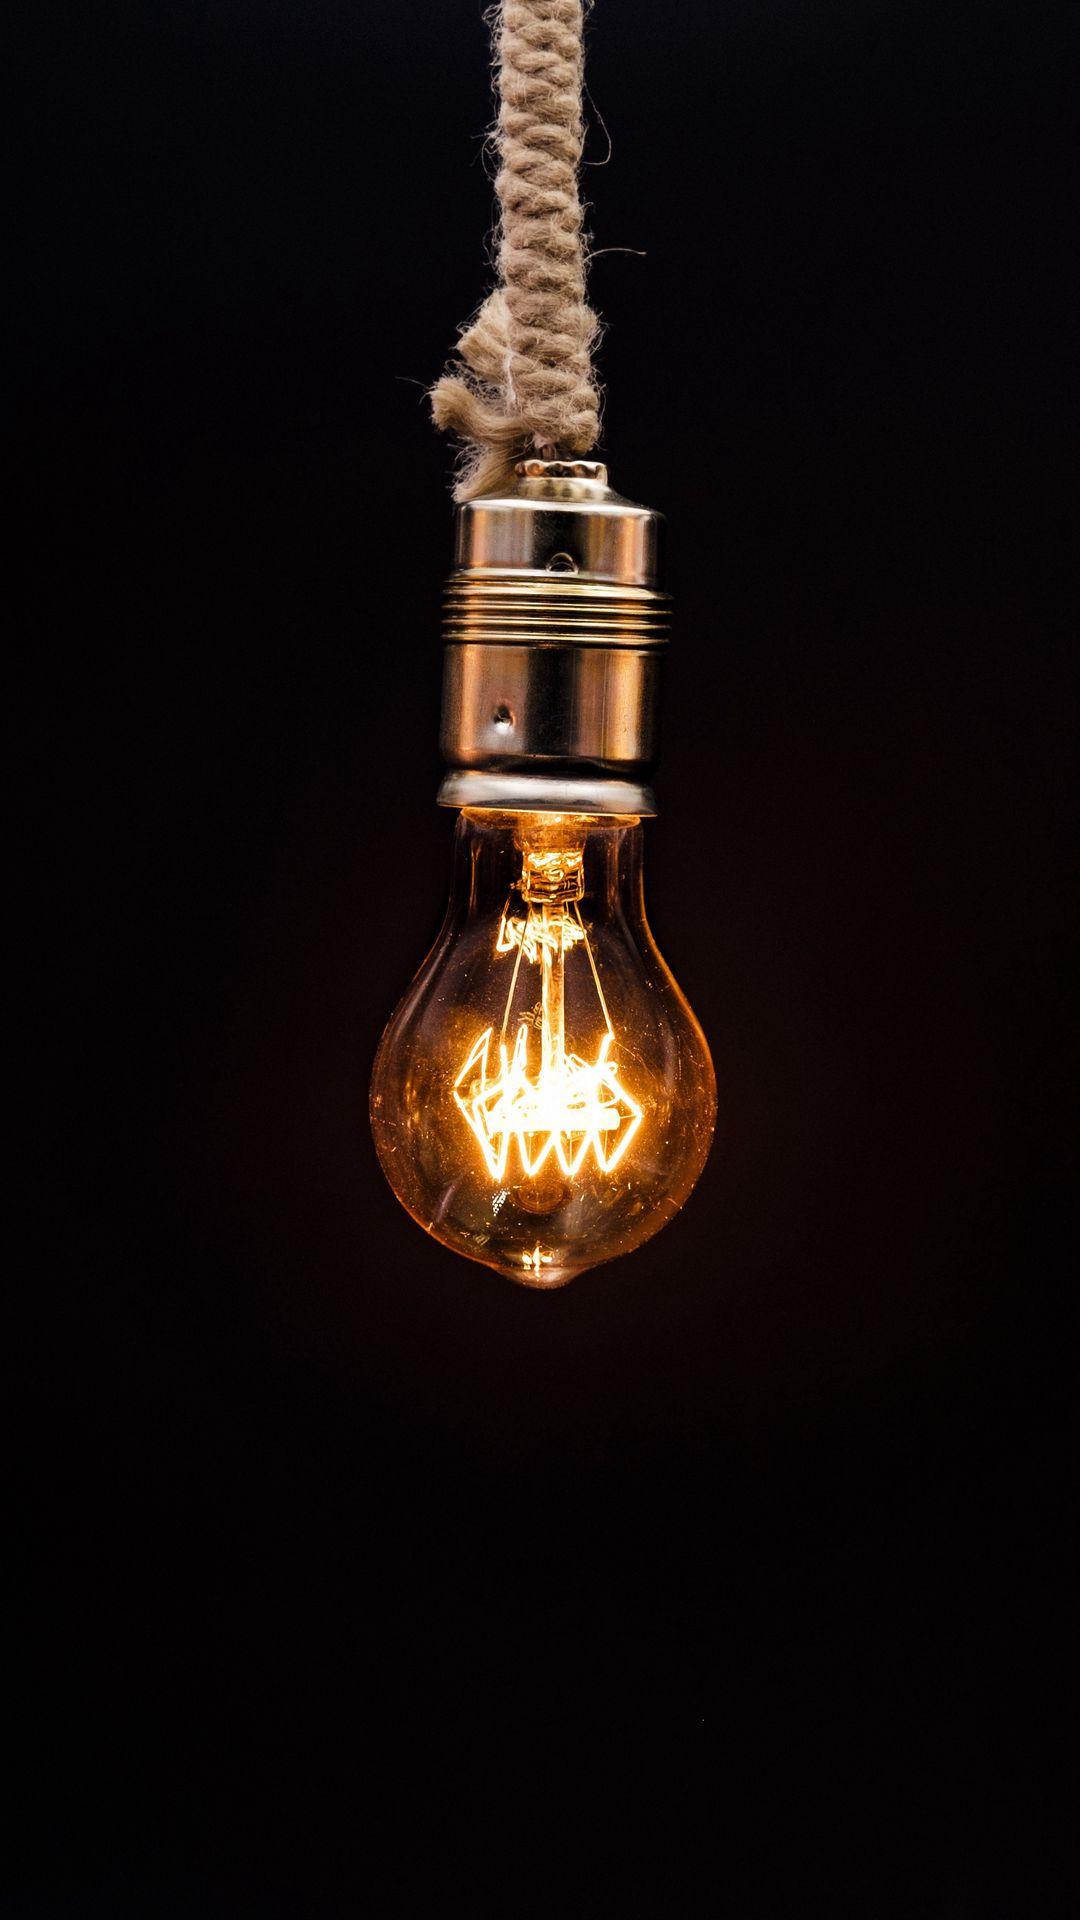 1080x1920 Wallpaper bulb, lighting, rope, electricity, edisons lamp